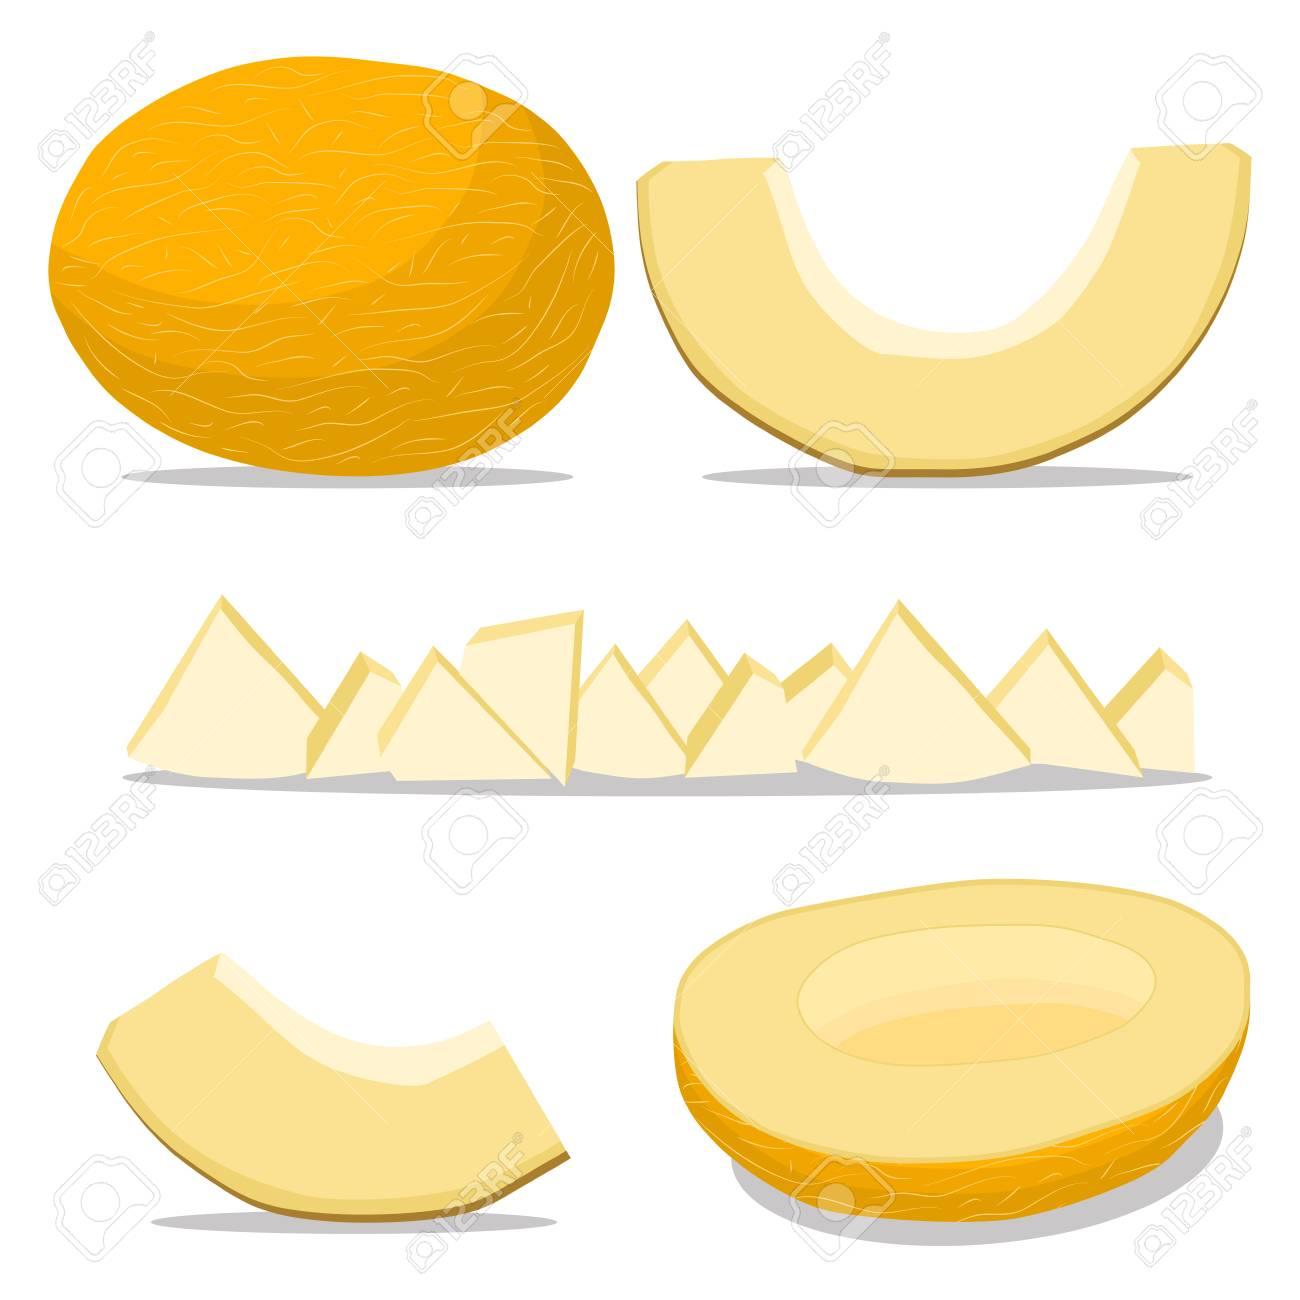 Vector illustration logo for whole ripe fruit yellow melon cut vector illustration logo for whole ripe fruit yellow melon cut half sliced cantaloupe buycottarizona Image collections